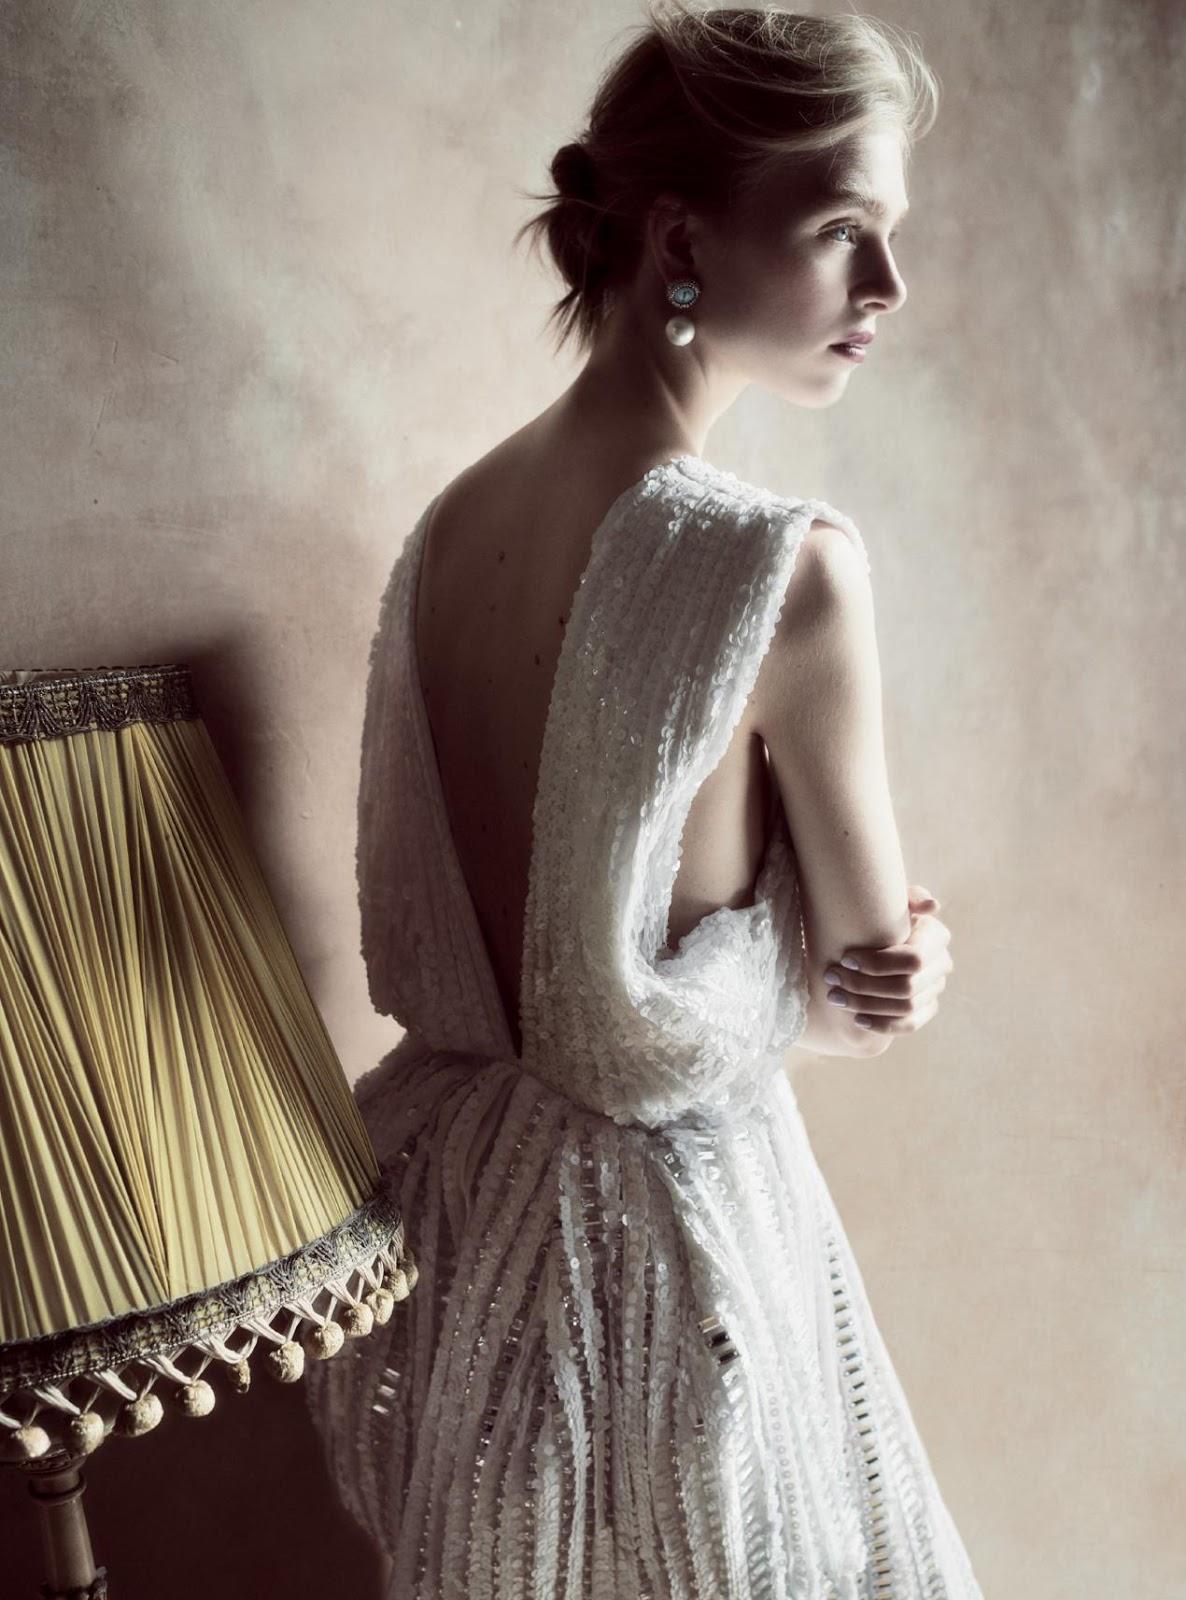 платье из шелка и шифона, декорированное кристаллами и пайетками; серьги с бриллиантами и жемчугом, Givenchy Haute Couture by Riccardo Tisci